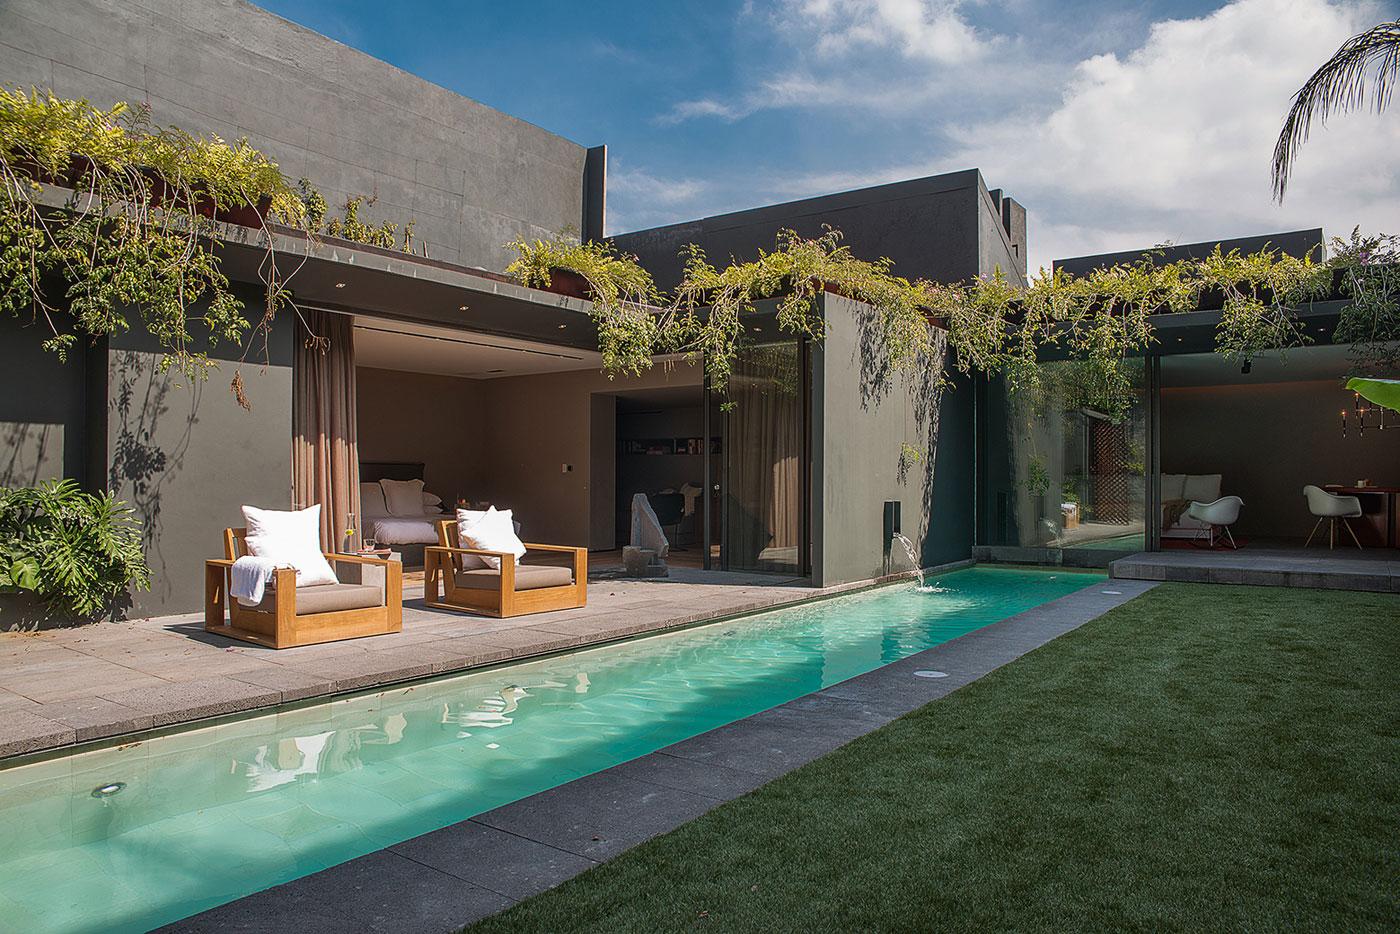 Modern Barrancas House in Mexico City by EZEQUIELFARCA